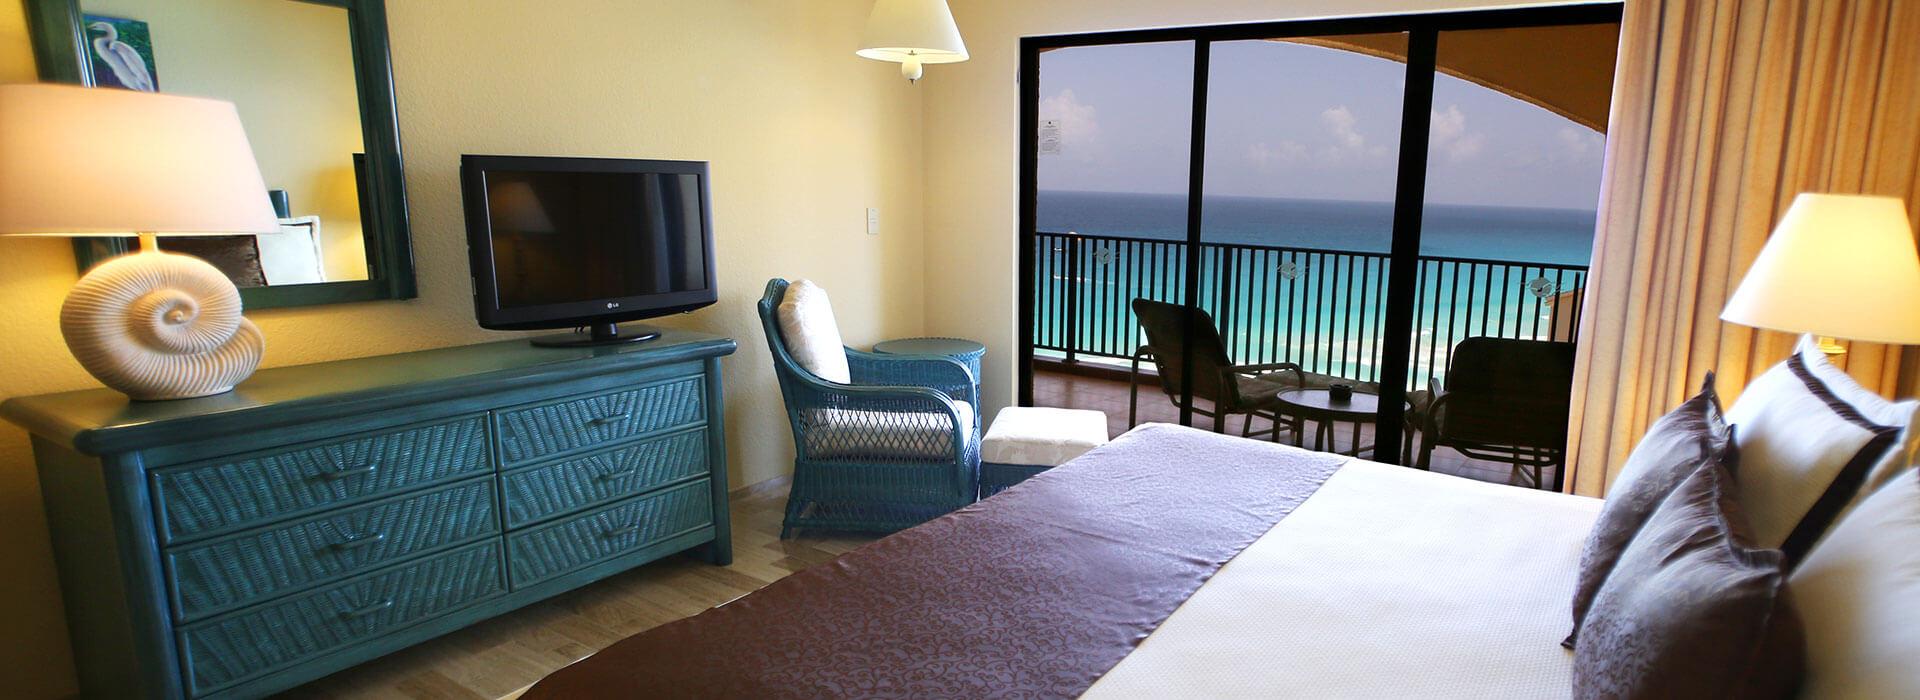 family bedroom in cancun resort